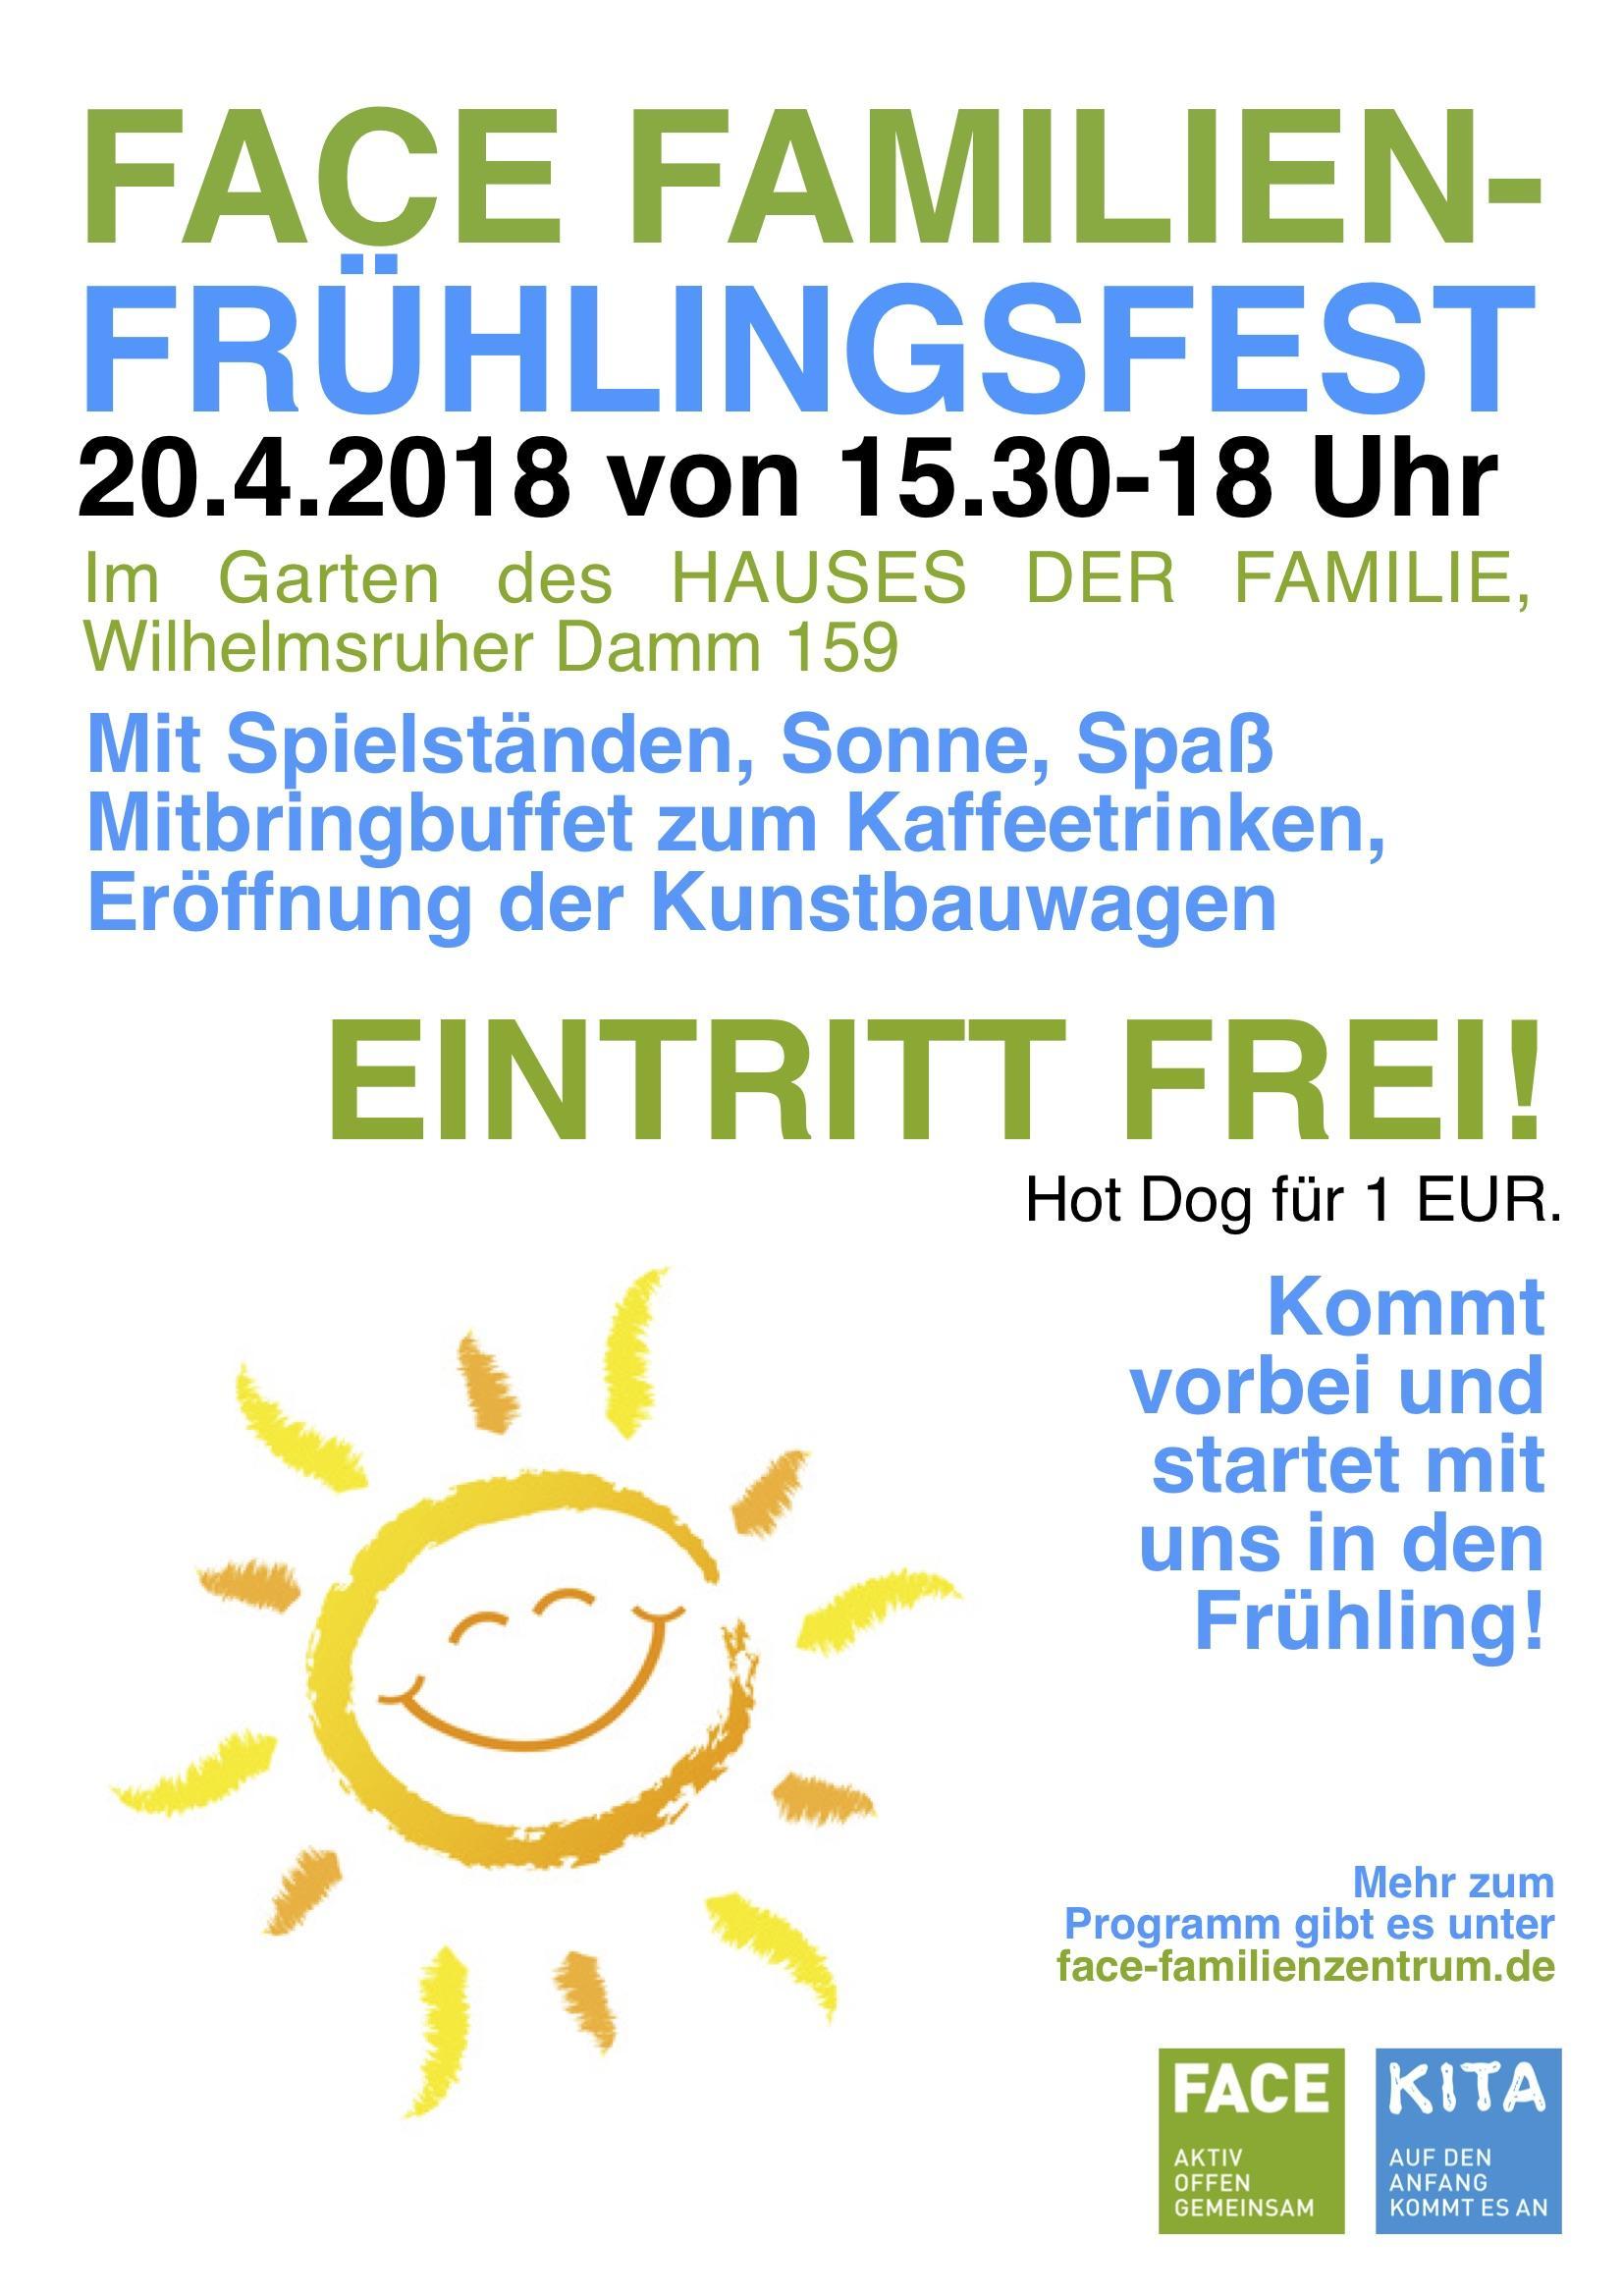 FACE Frühlingsfest am 20.4.18